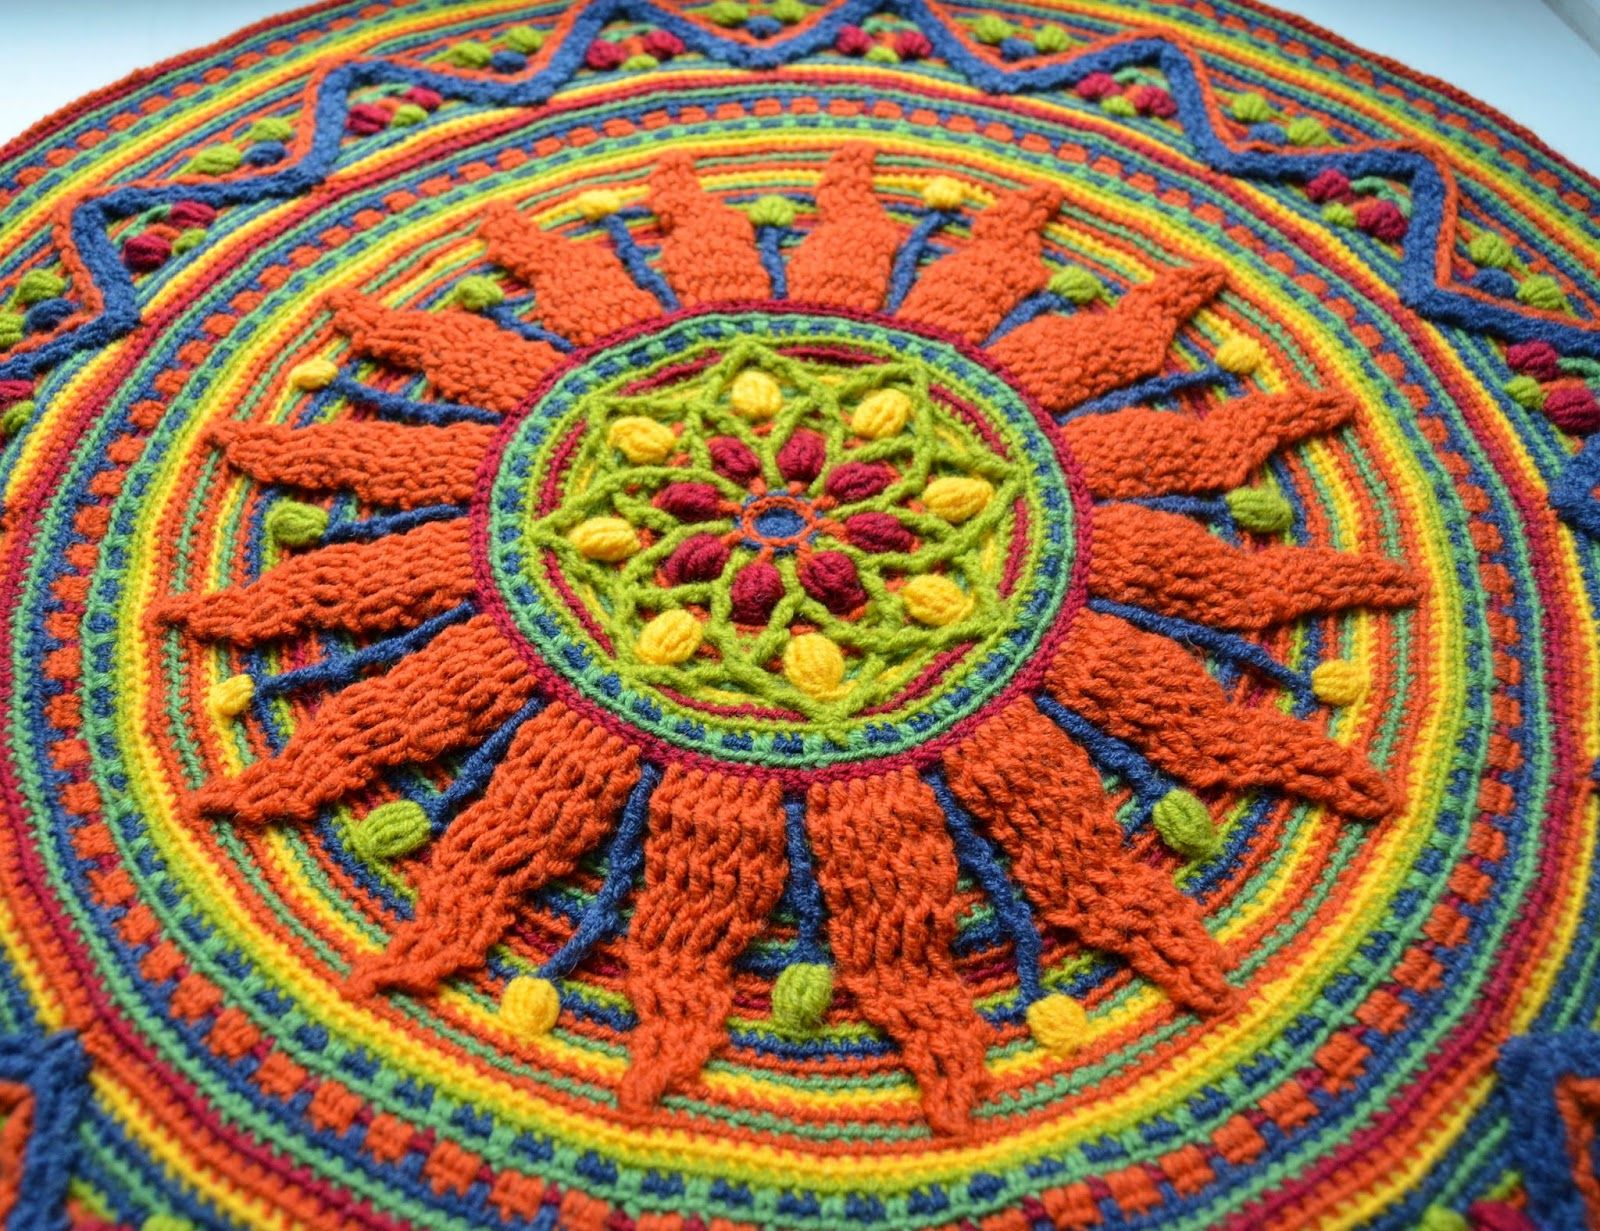 Sunny Rug For Meditation